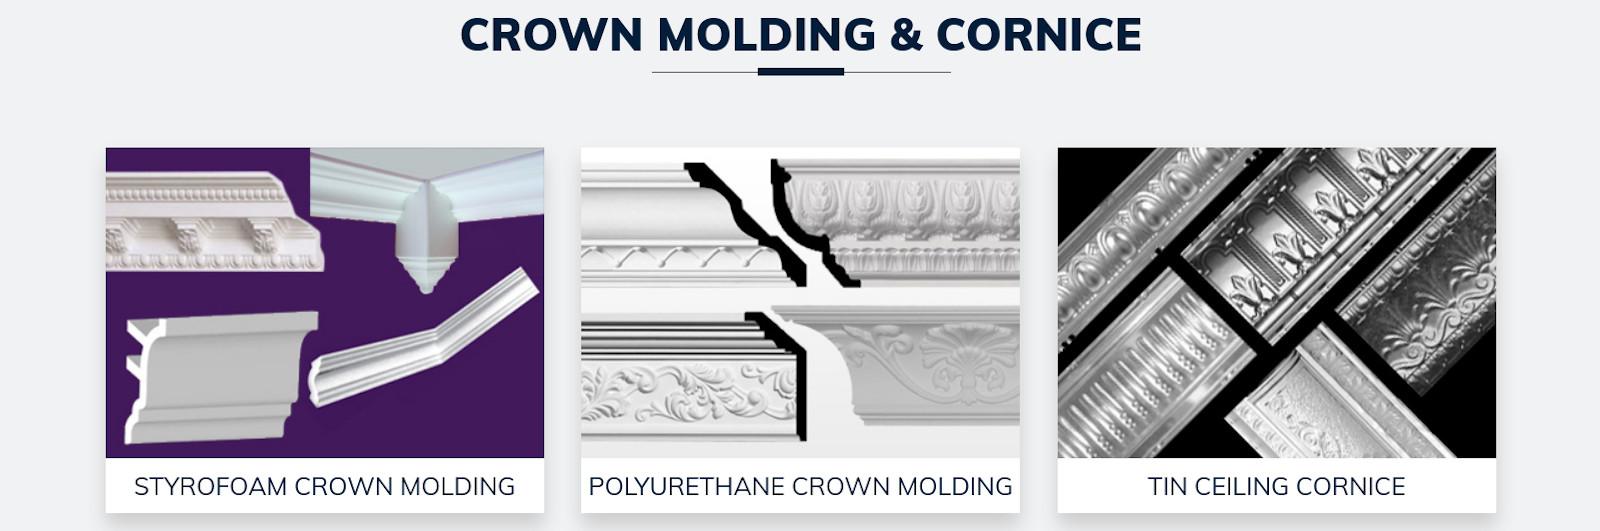 Crown molding and cornice